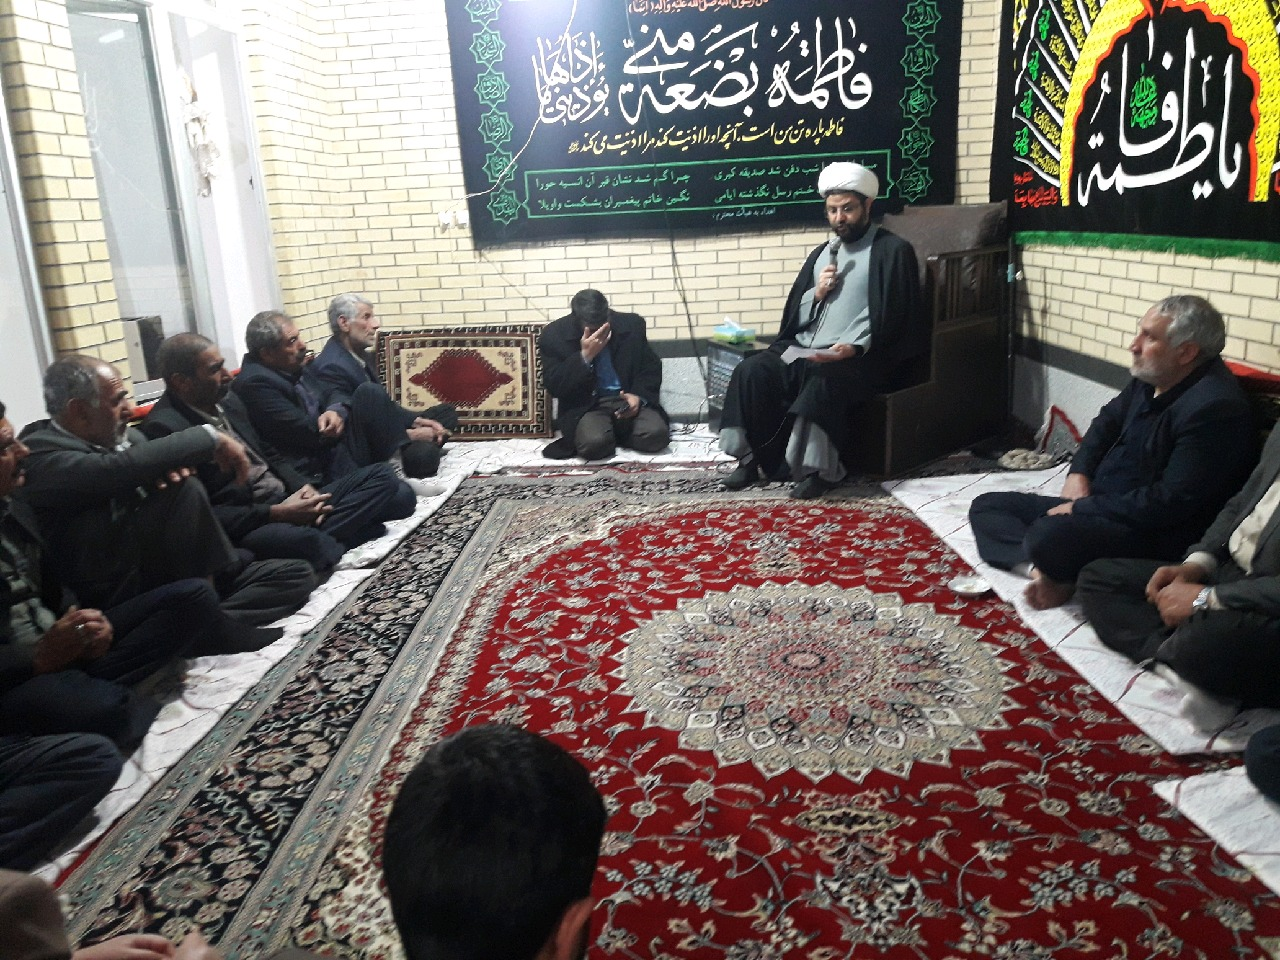 السلامعلیکِ یا فاطمه الزهرا(سلام اللهعلیها) سخنرانی امام جمعه محترم قهدریجان در جمع عزاداران فاطمی